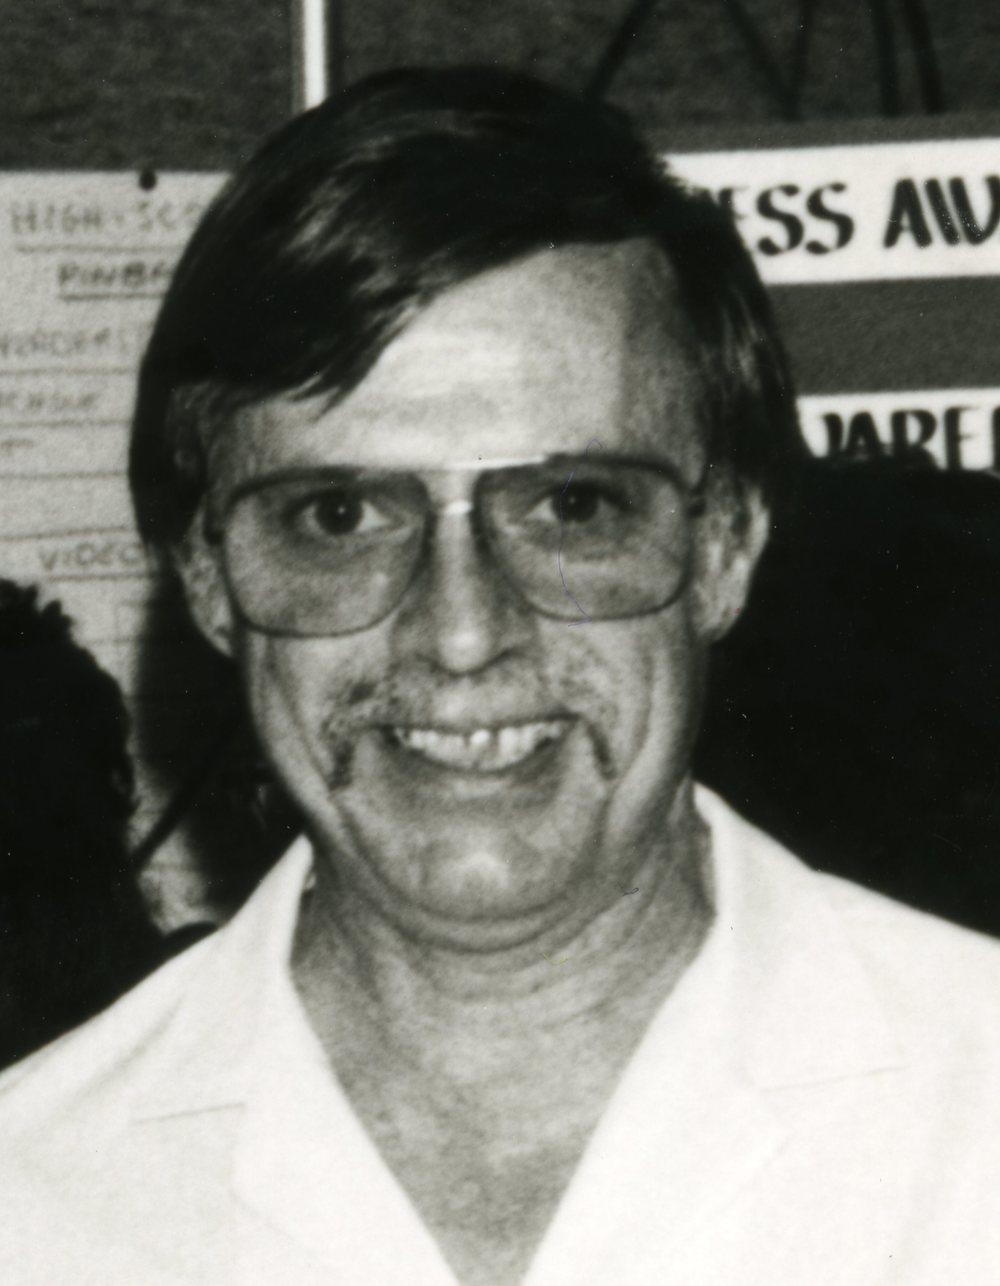 Alan Kilbourn